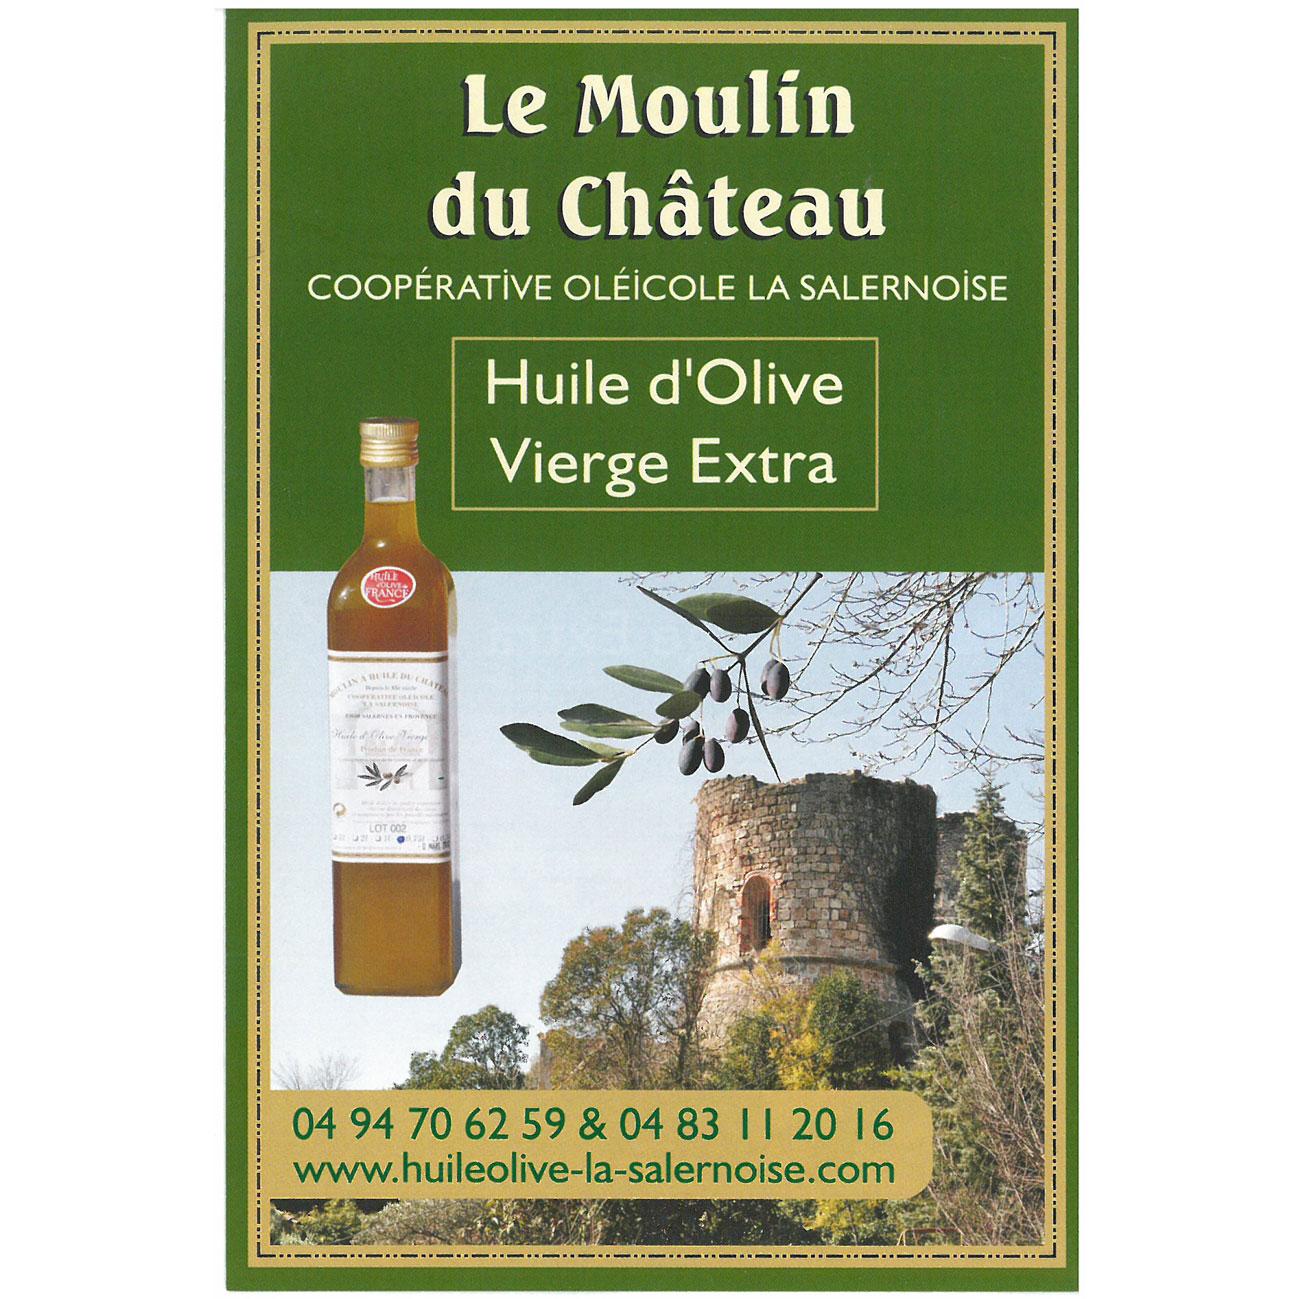 Coopérative Oléicole La Salernoise - Moulin du Château